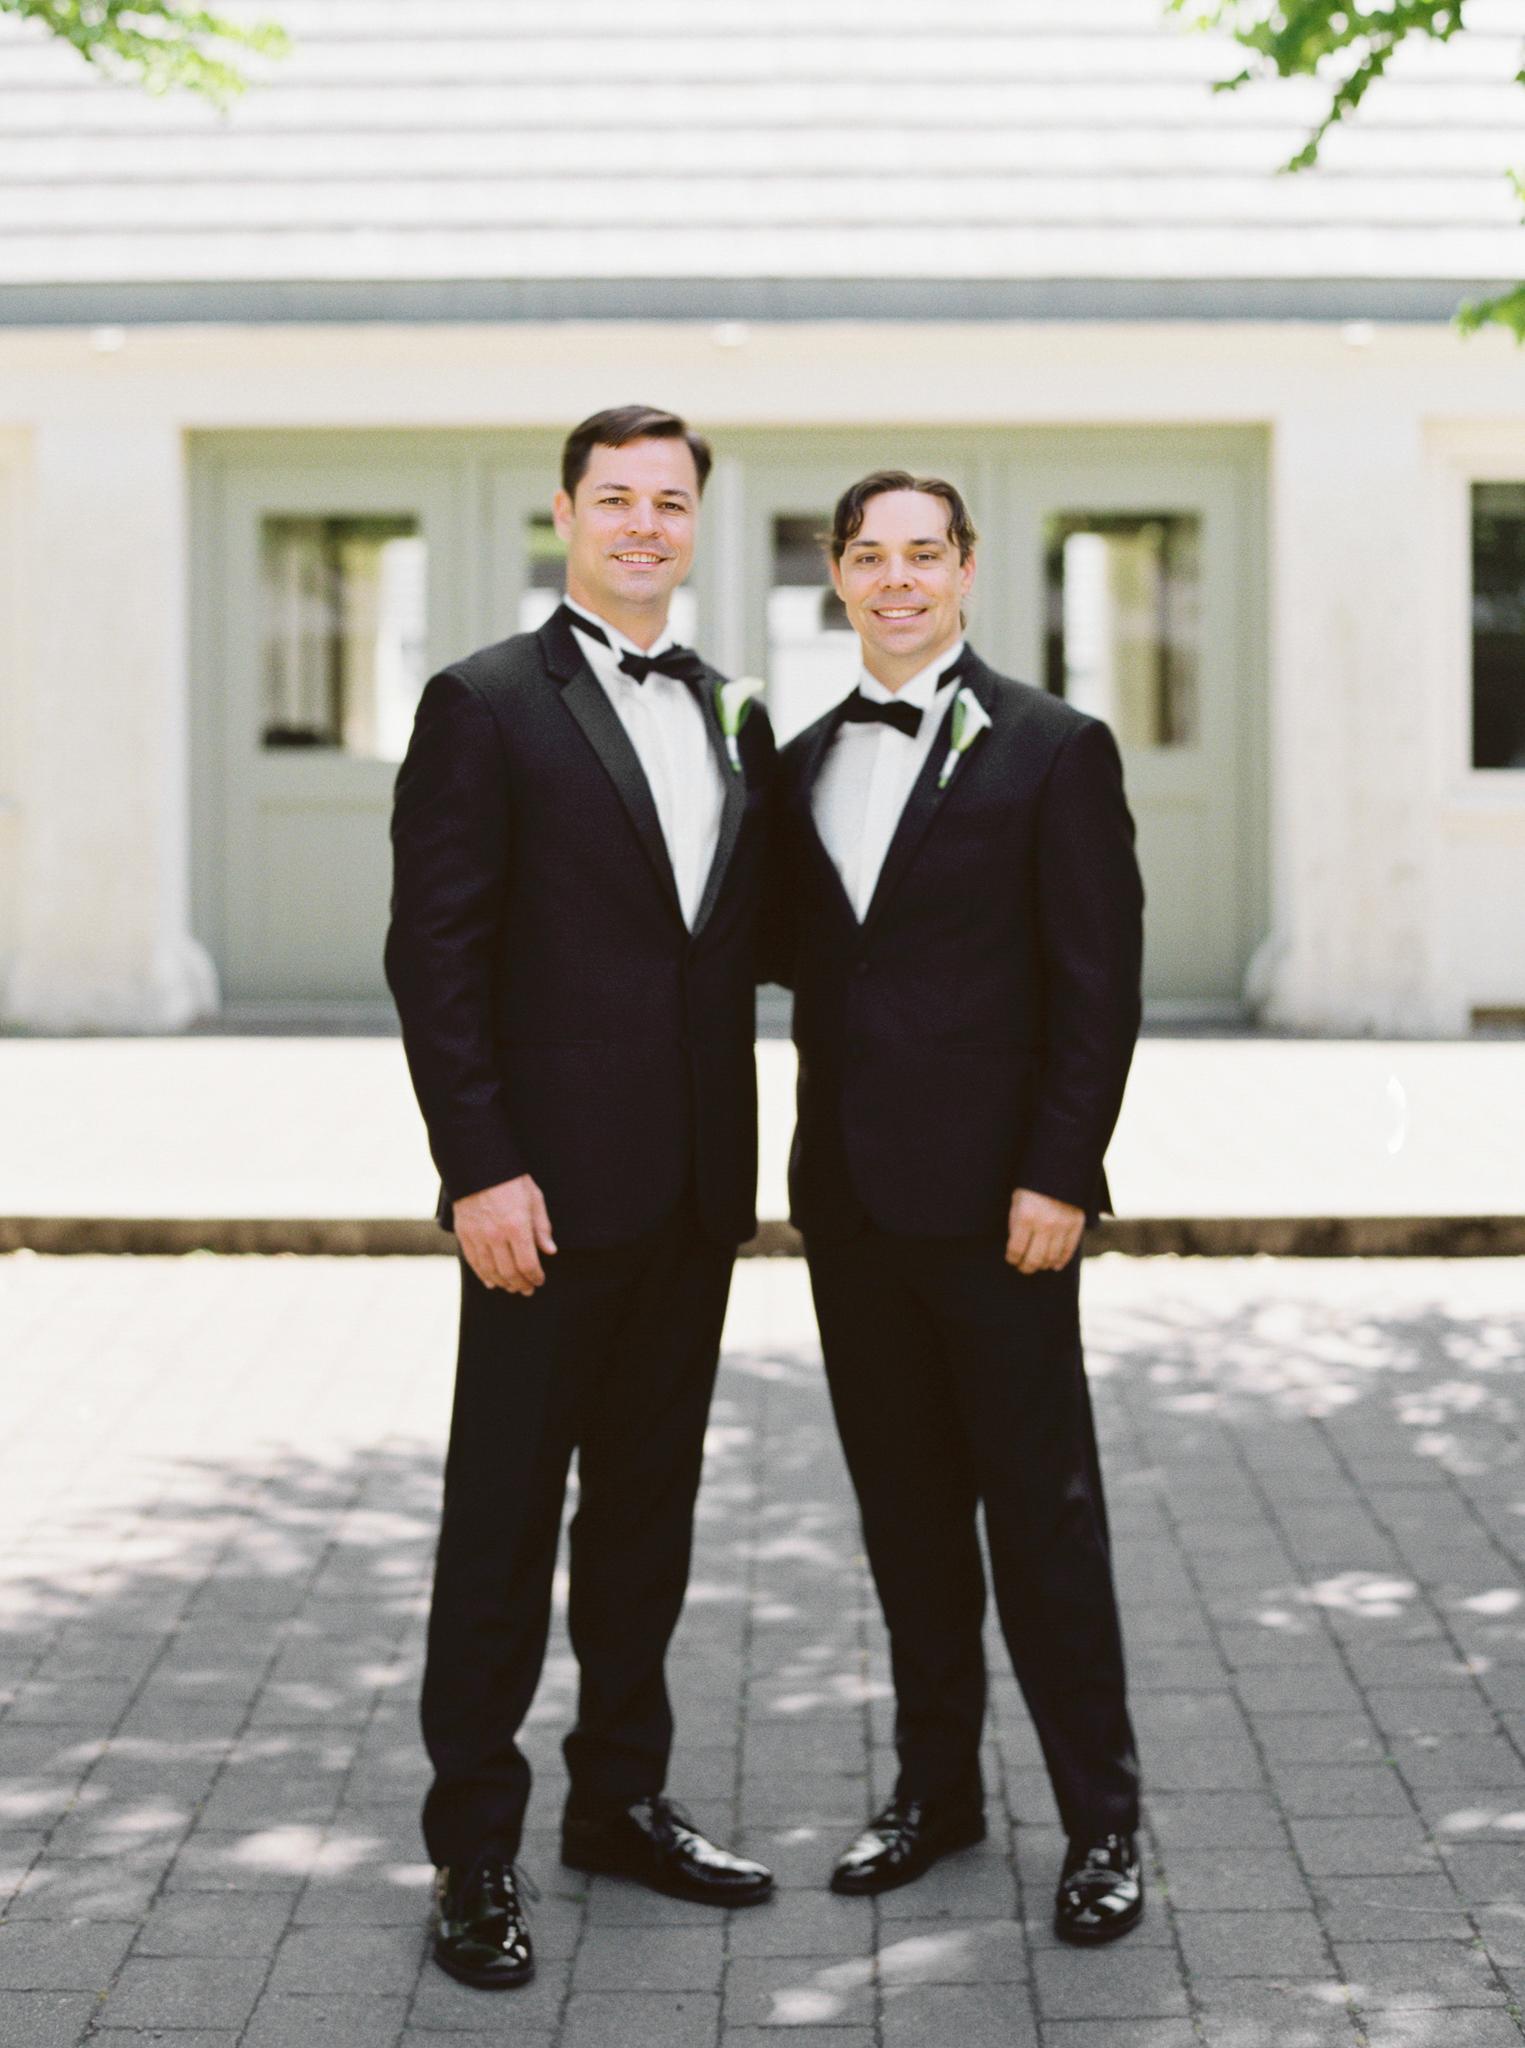 069OutliveCreative_Travel_Photographer_Videographer_Lewis&Clark_Oregon_Elegant_BlackTie_Destination_Wedding.jpg